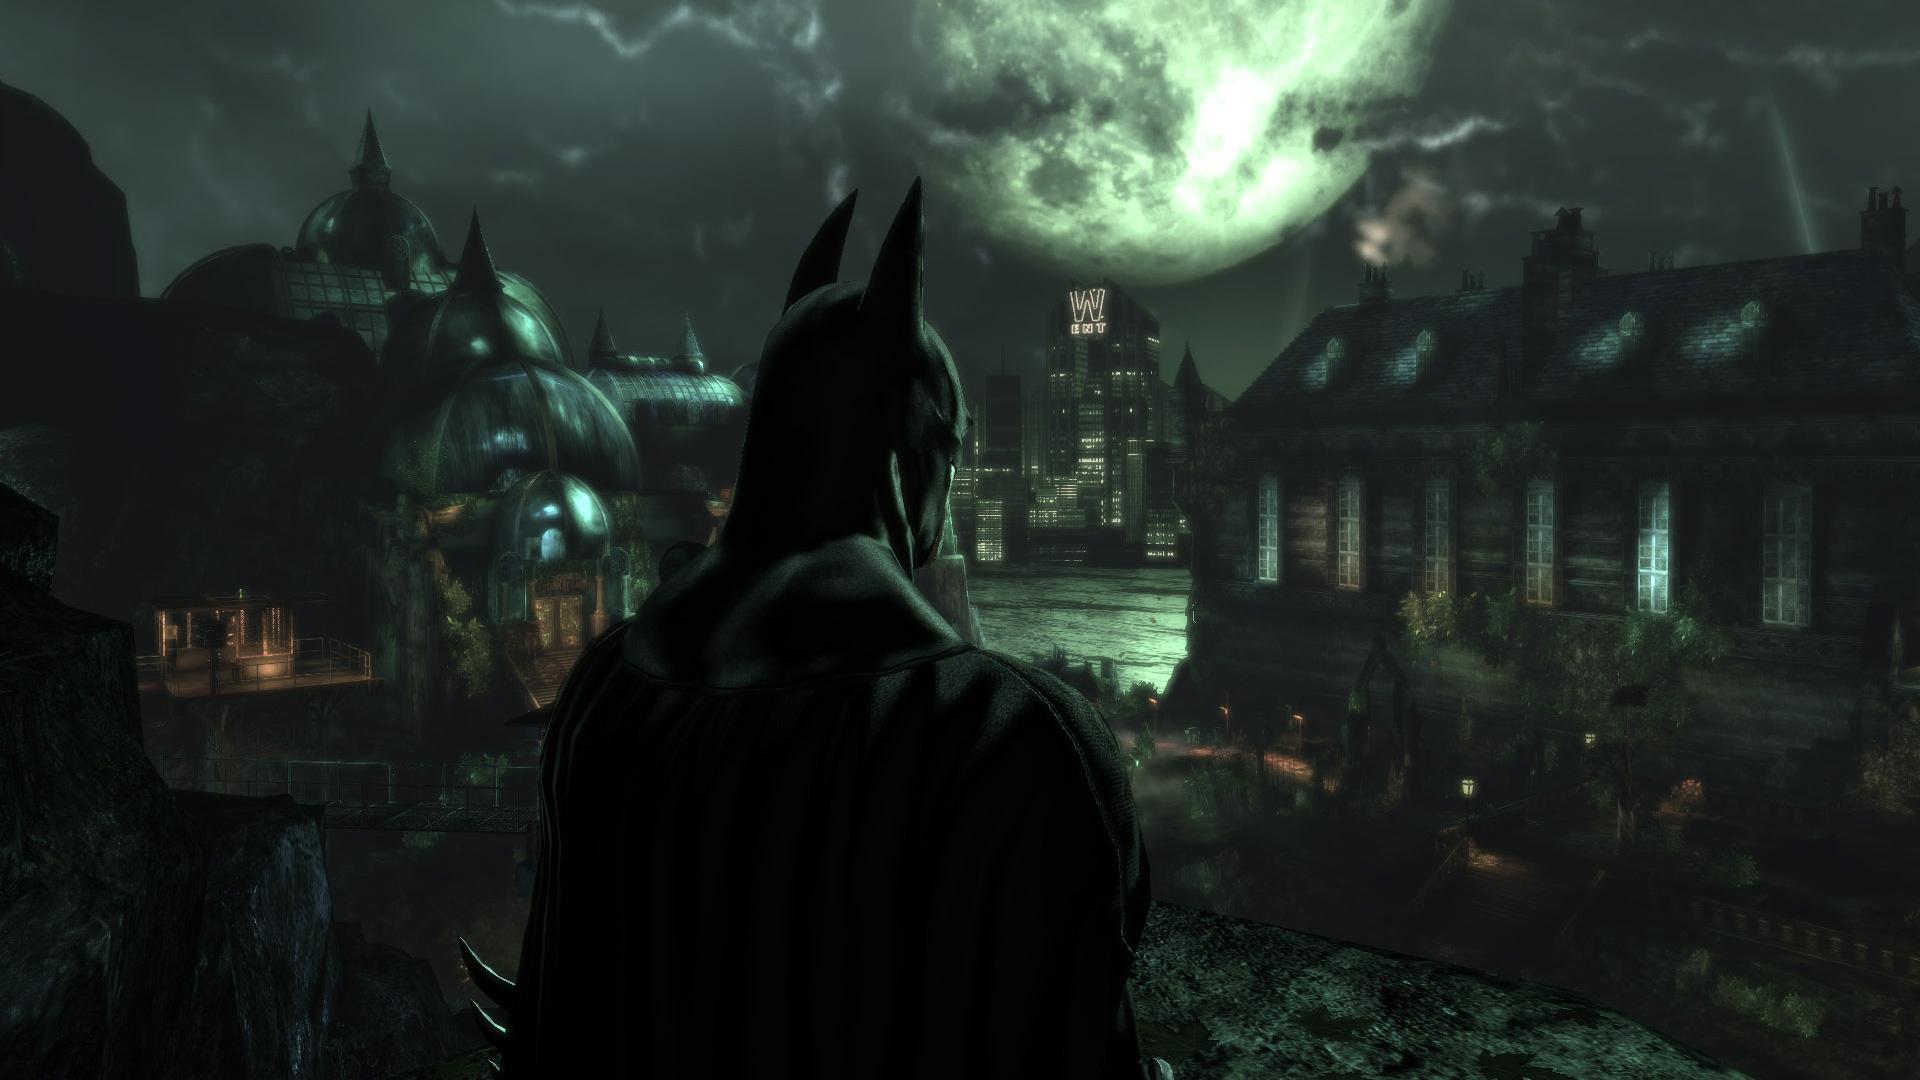 Image for Batman Arkham Asylum 19201080 Gameplay 1920x1080